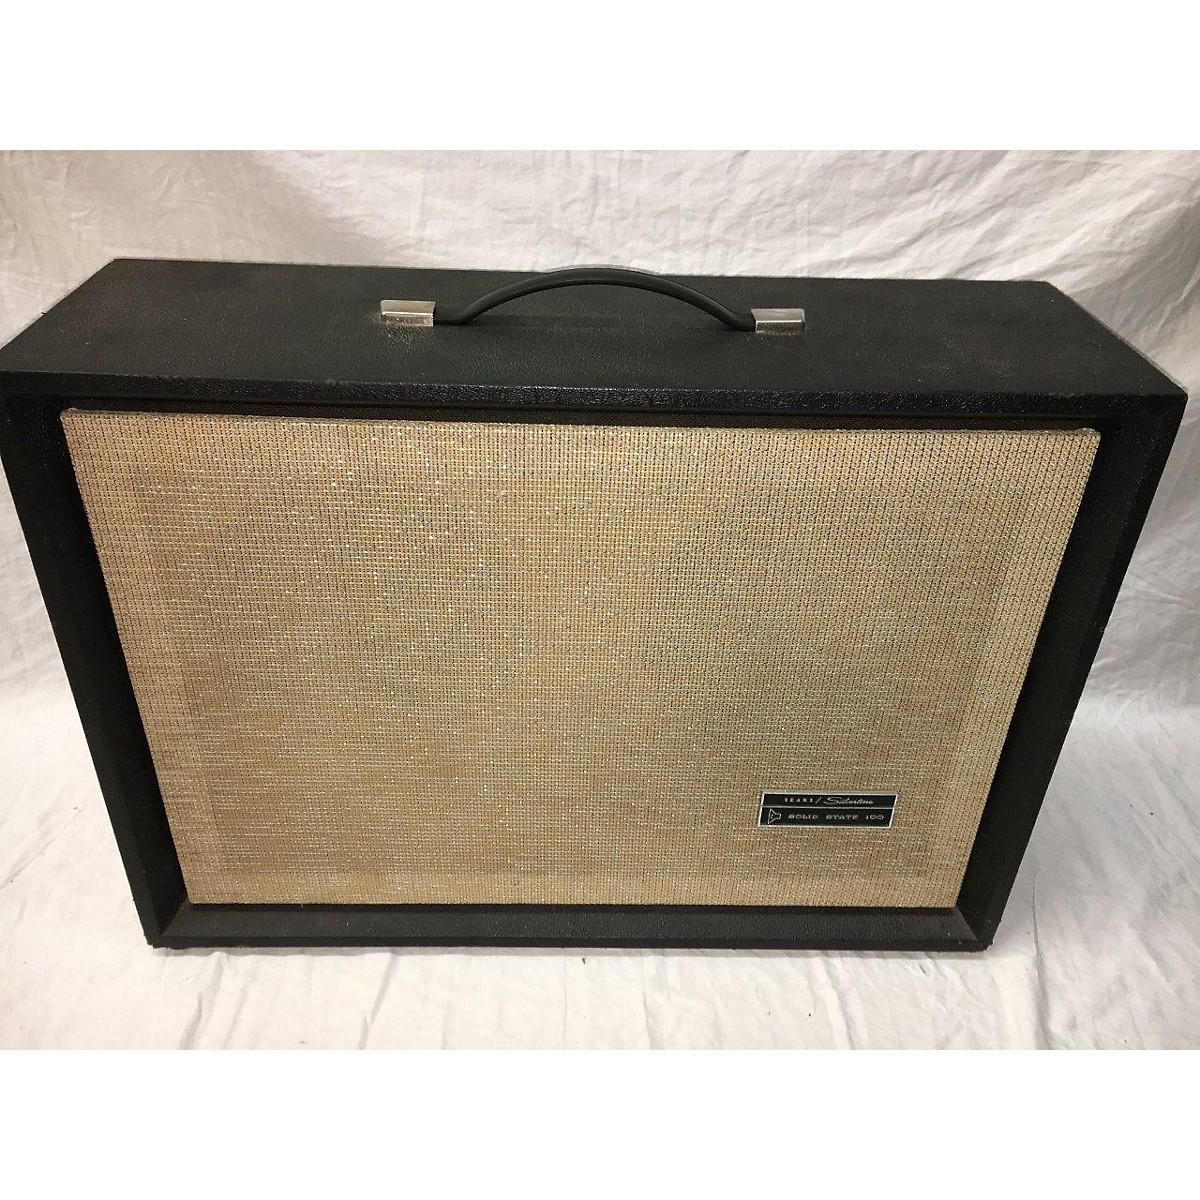 In Store Vintage Vintage 1960s SEARS SILVERTONE 2X12 Guitar Cabinet